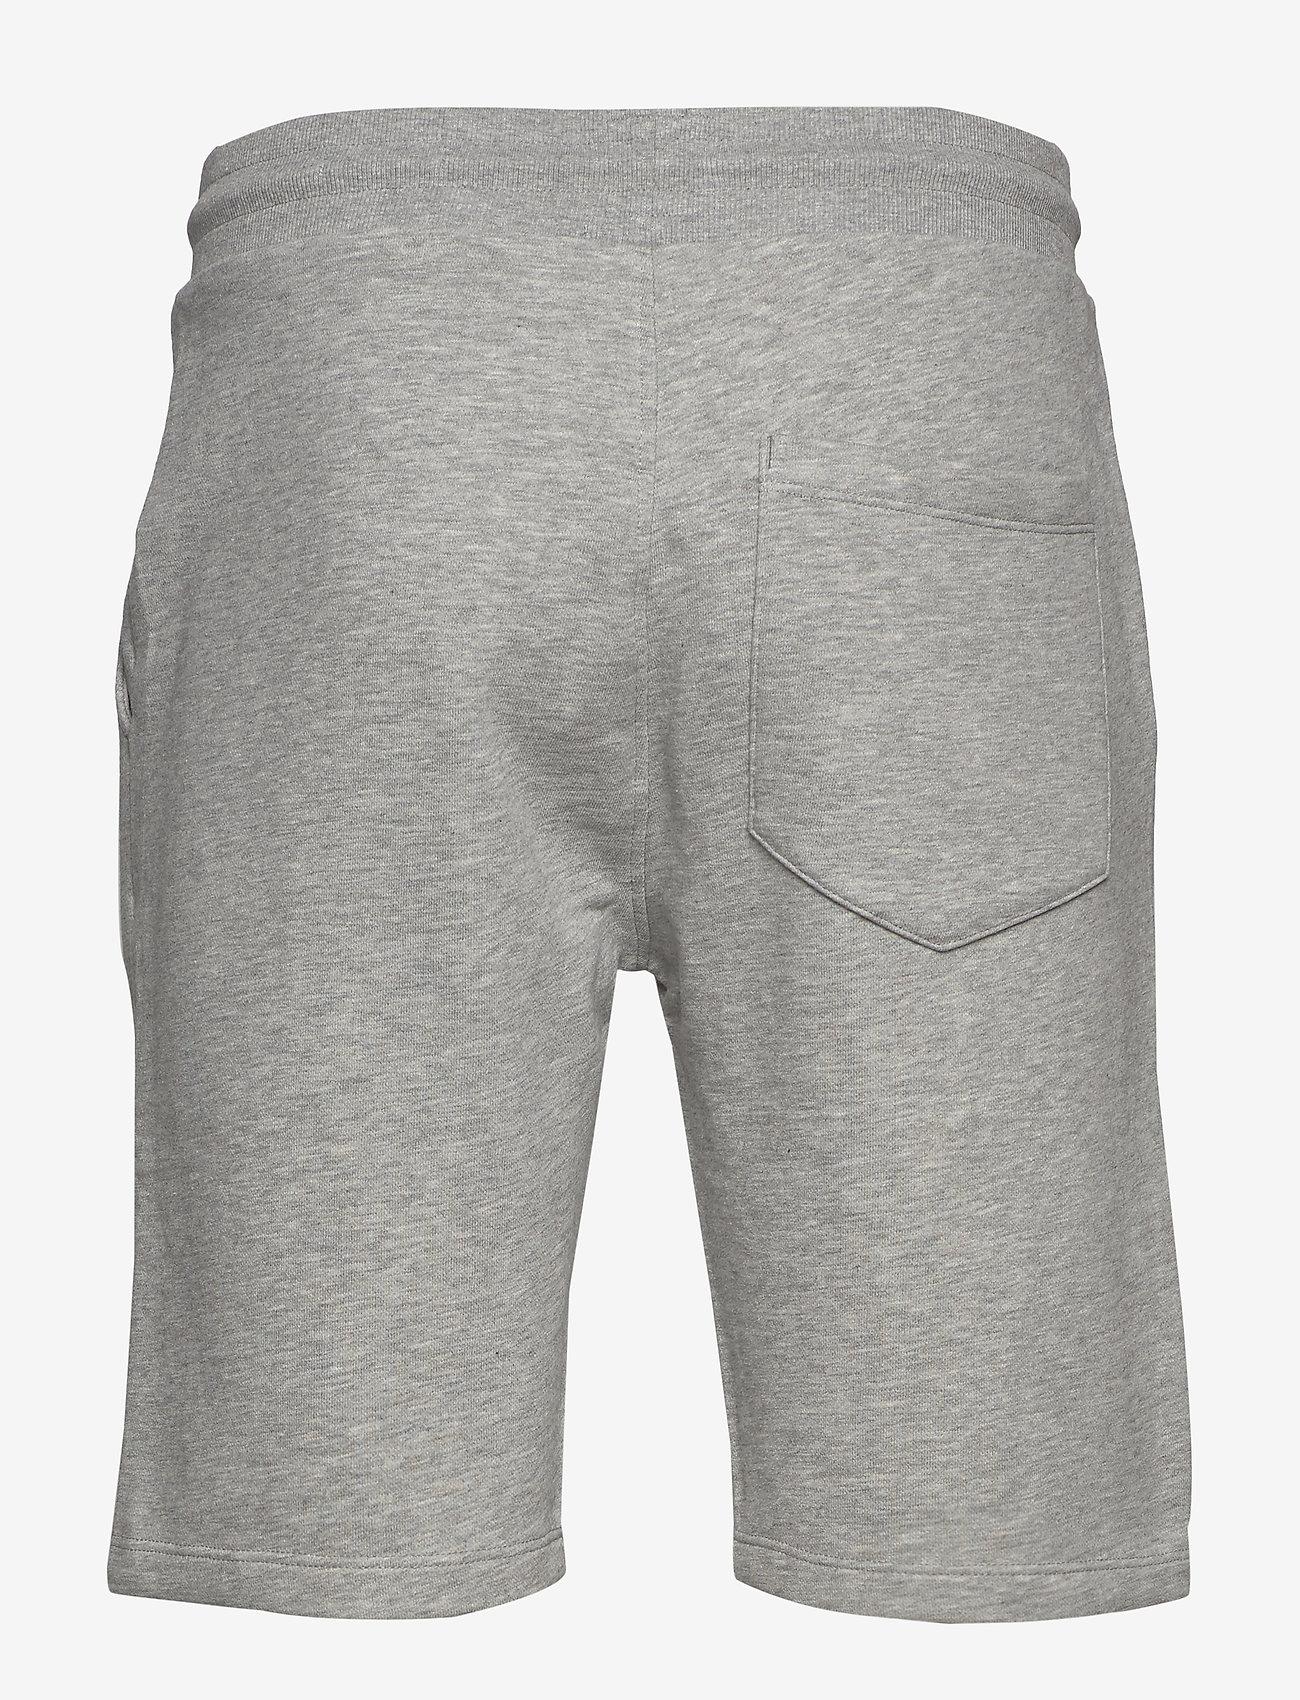 Edc By Esprit Shorts Knitted - Medium Grey 5